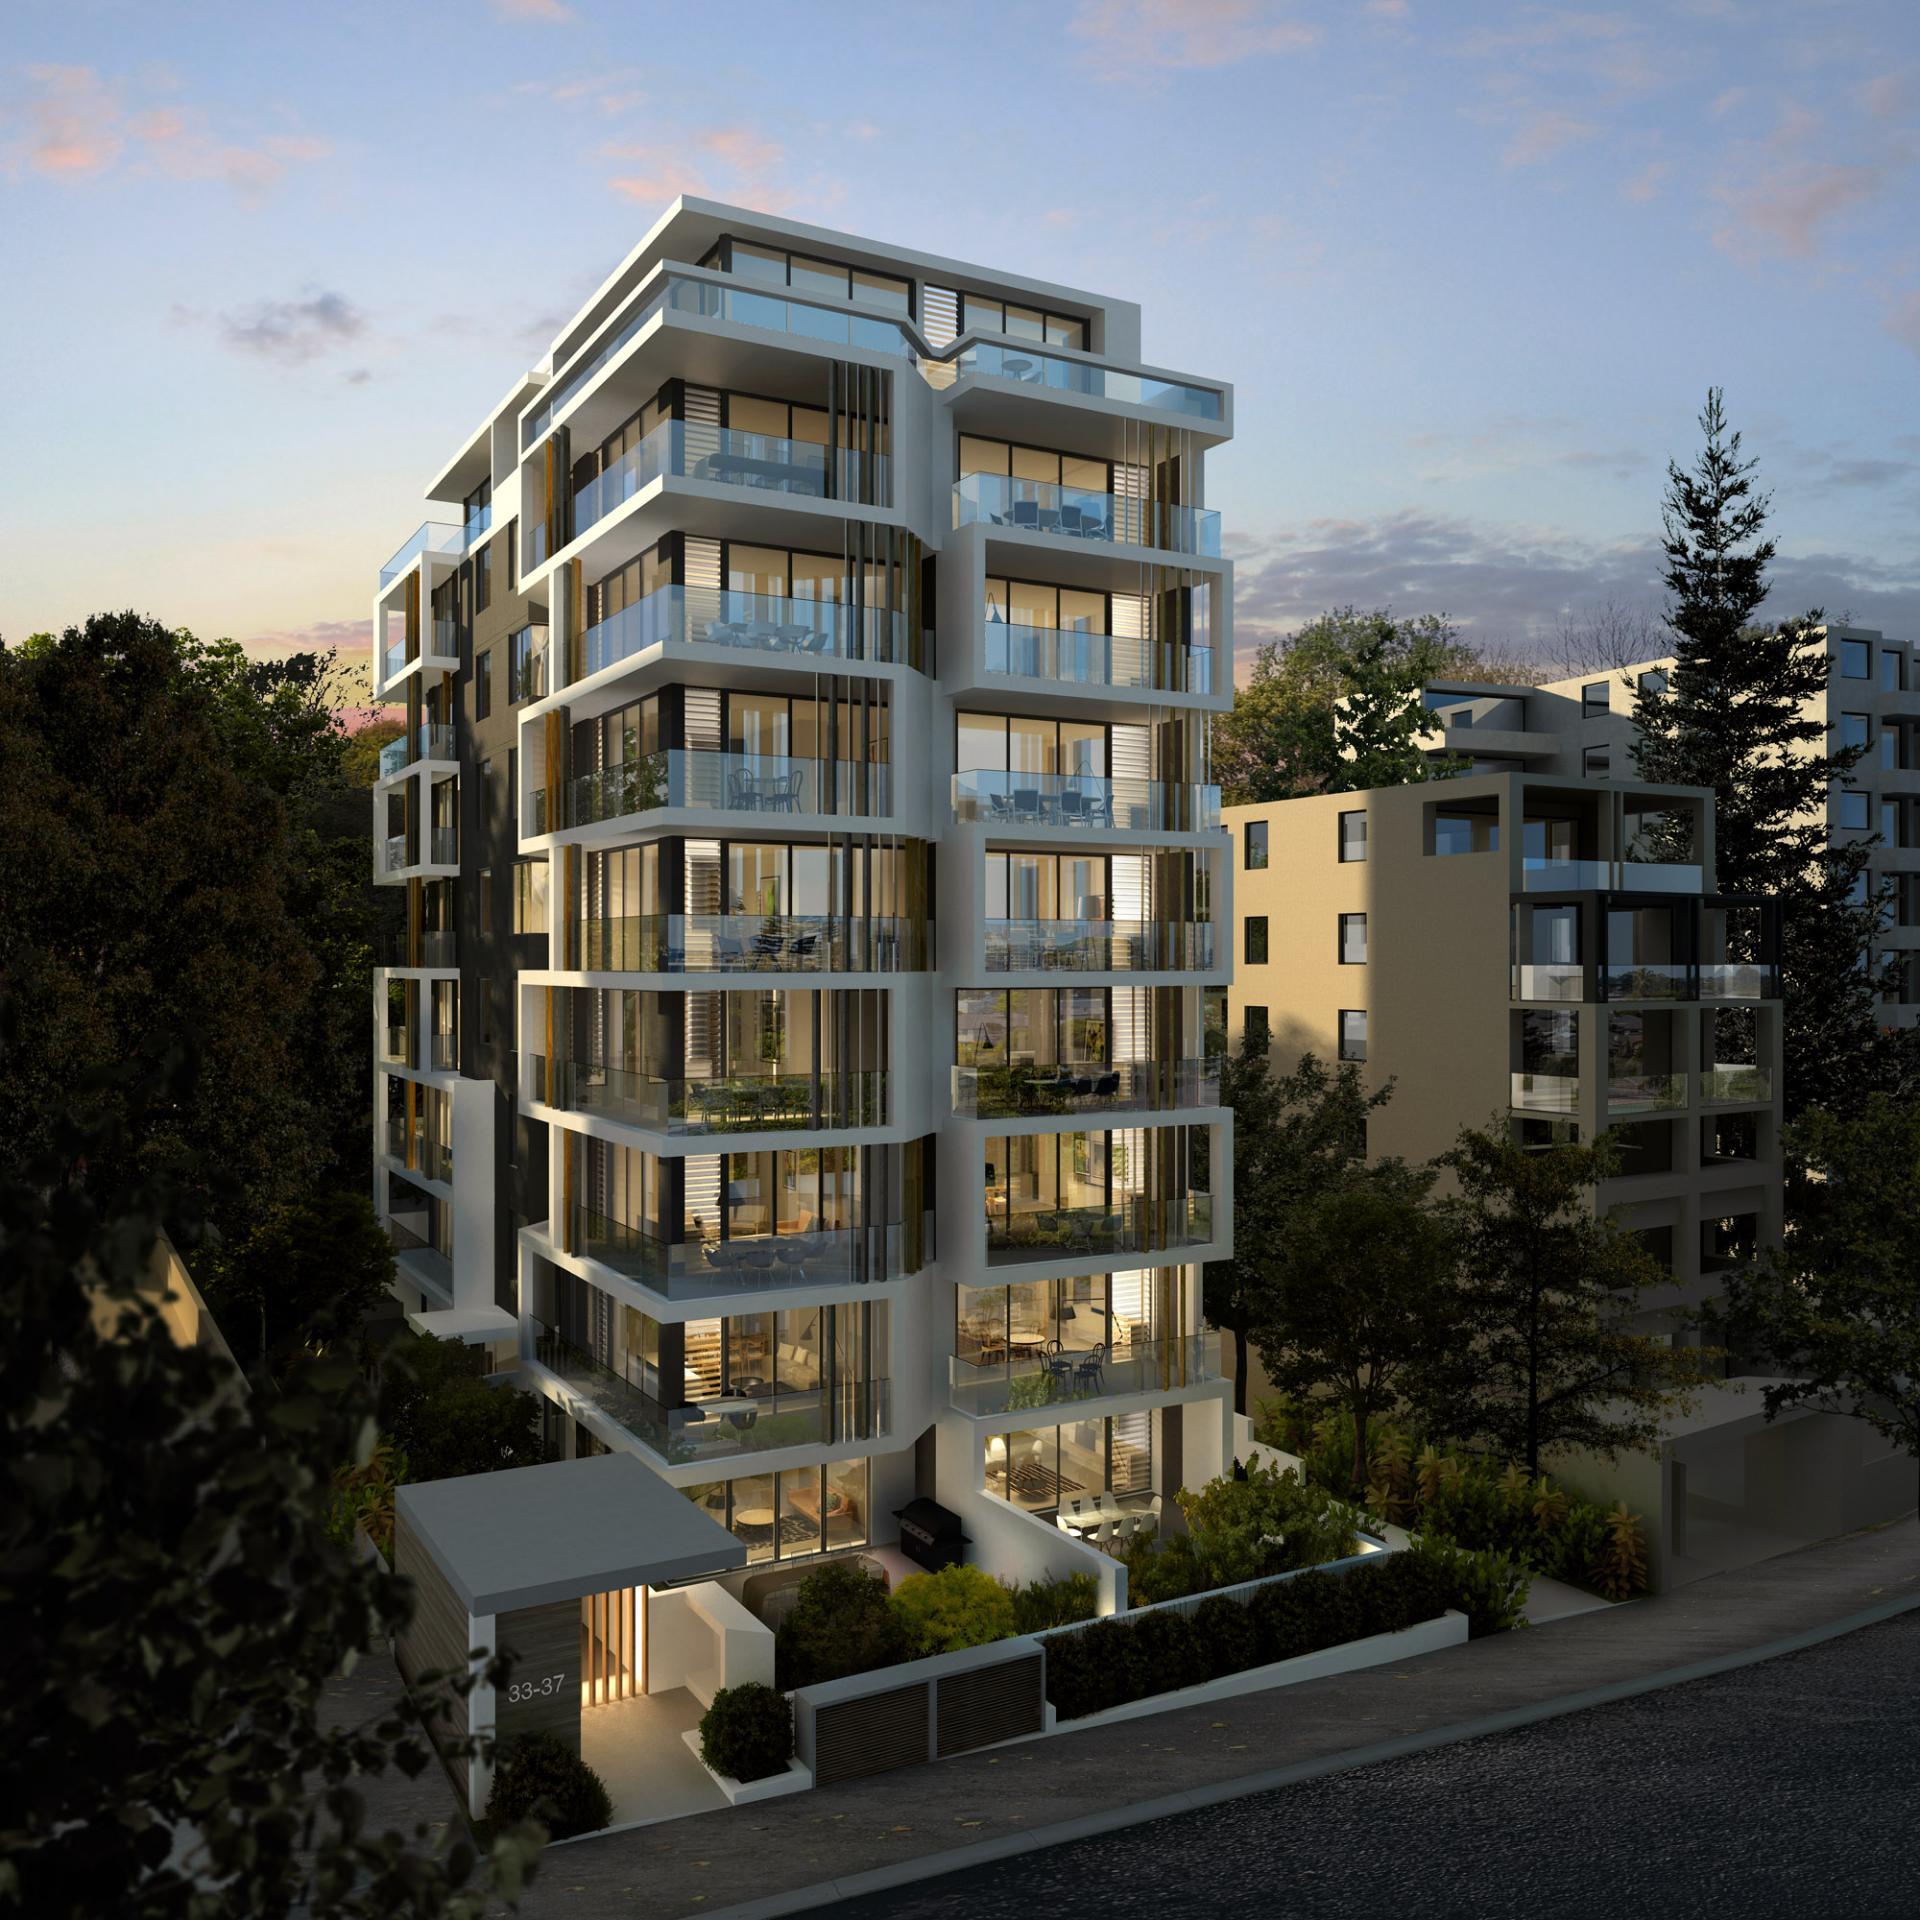 3 bedroom Apartment for sale in Bondi Junction